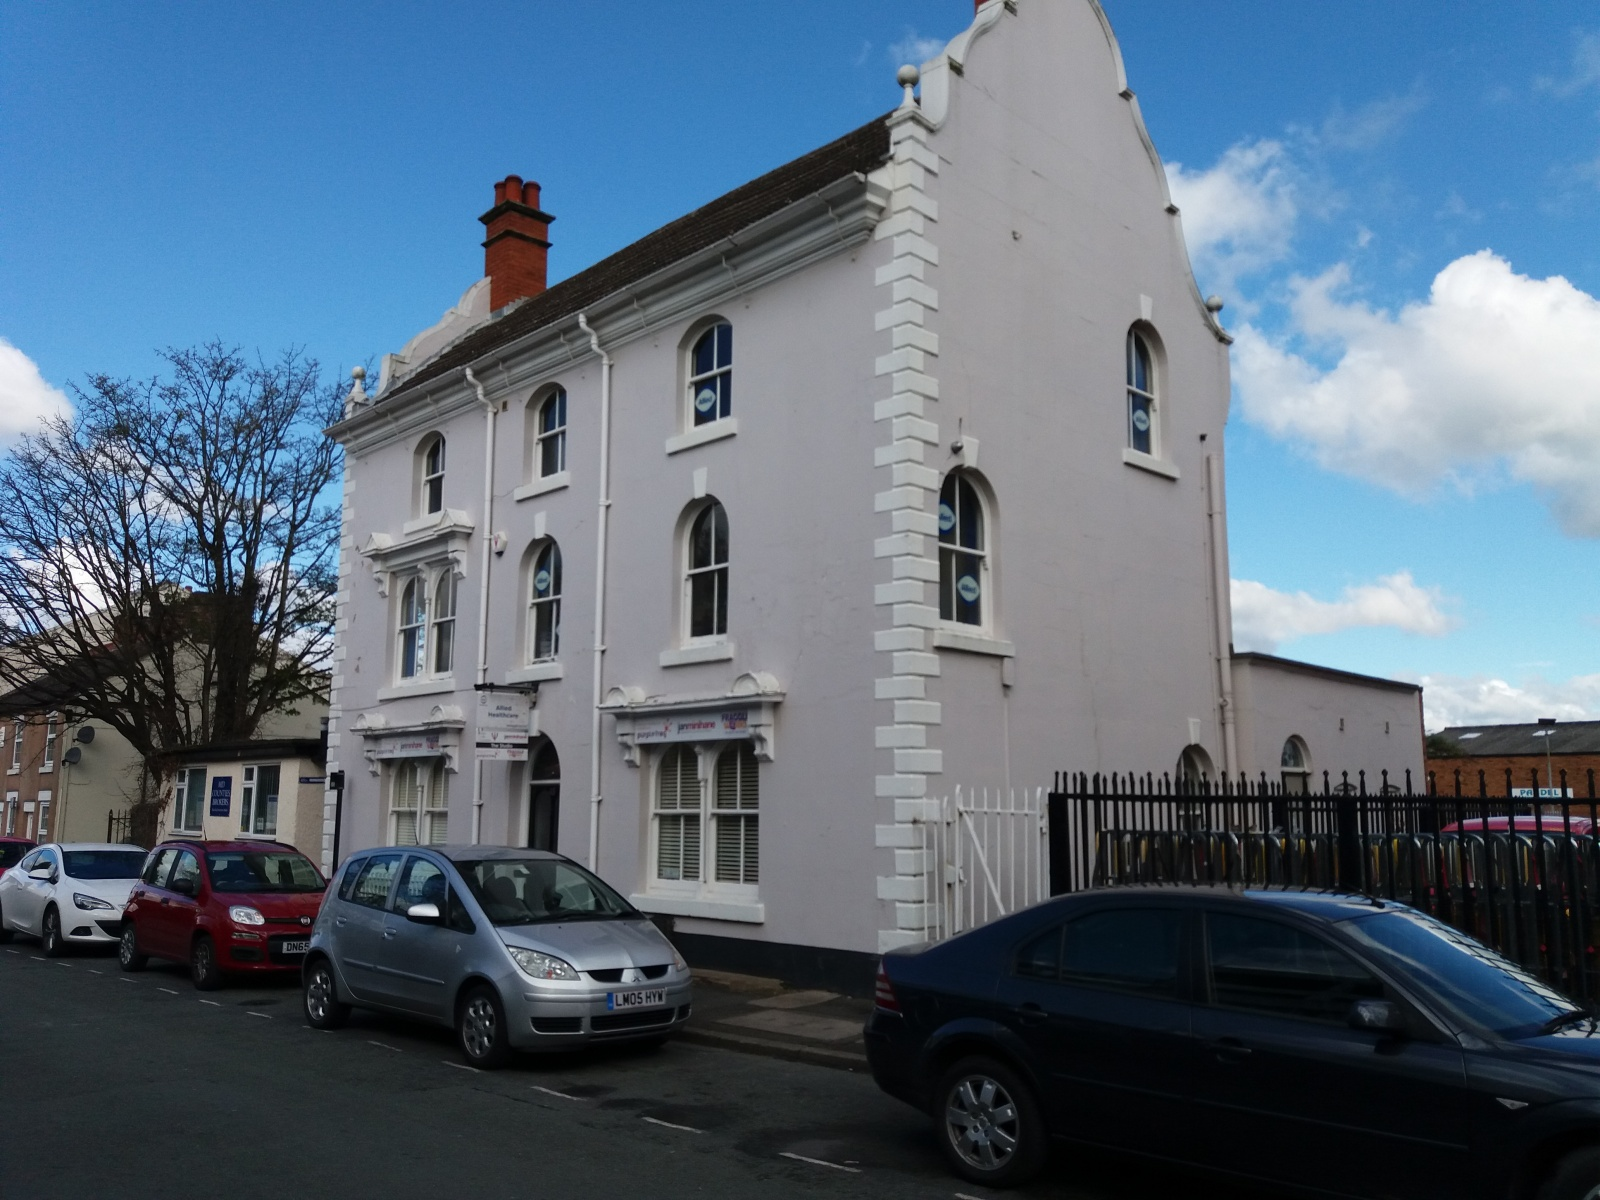 48 , Walker Street, Wellington, Telford, Shropshire